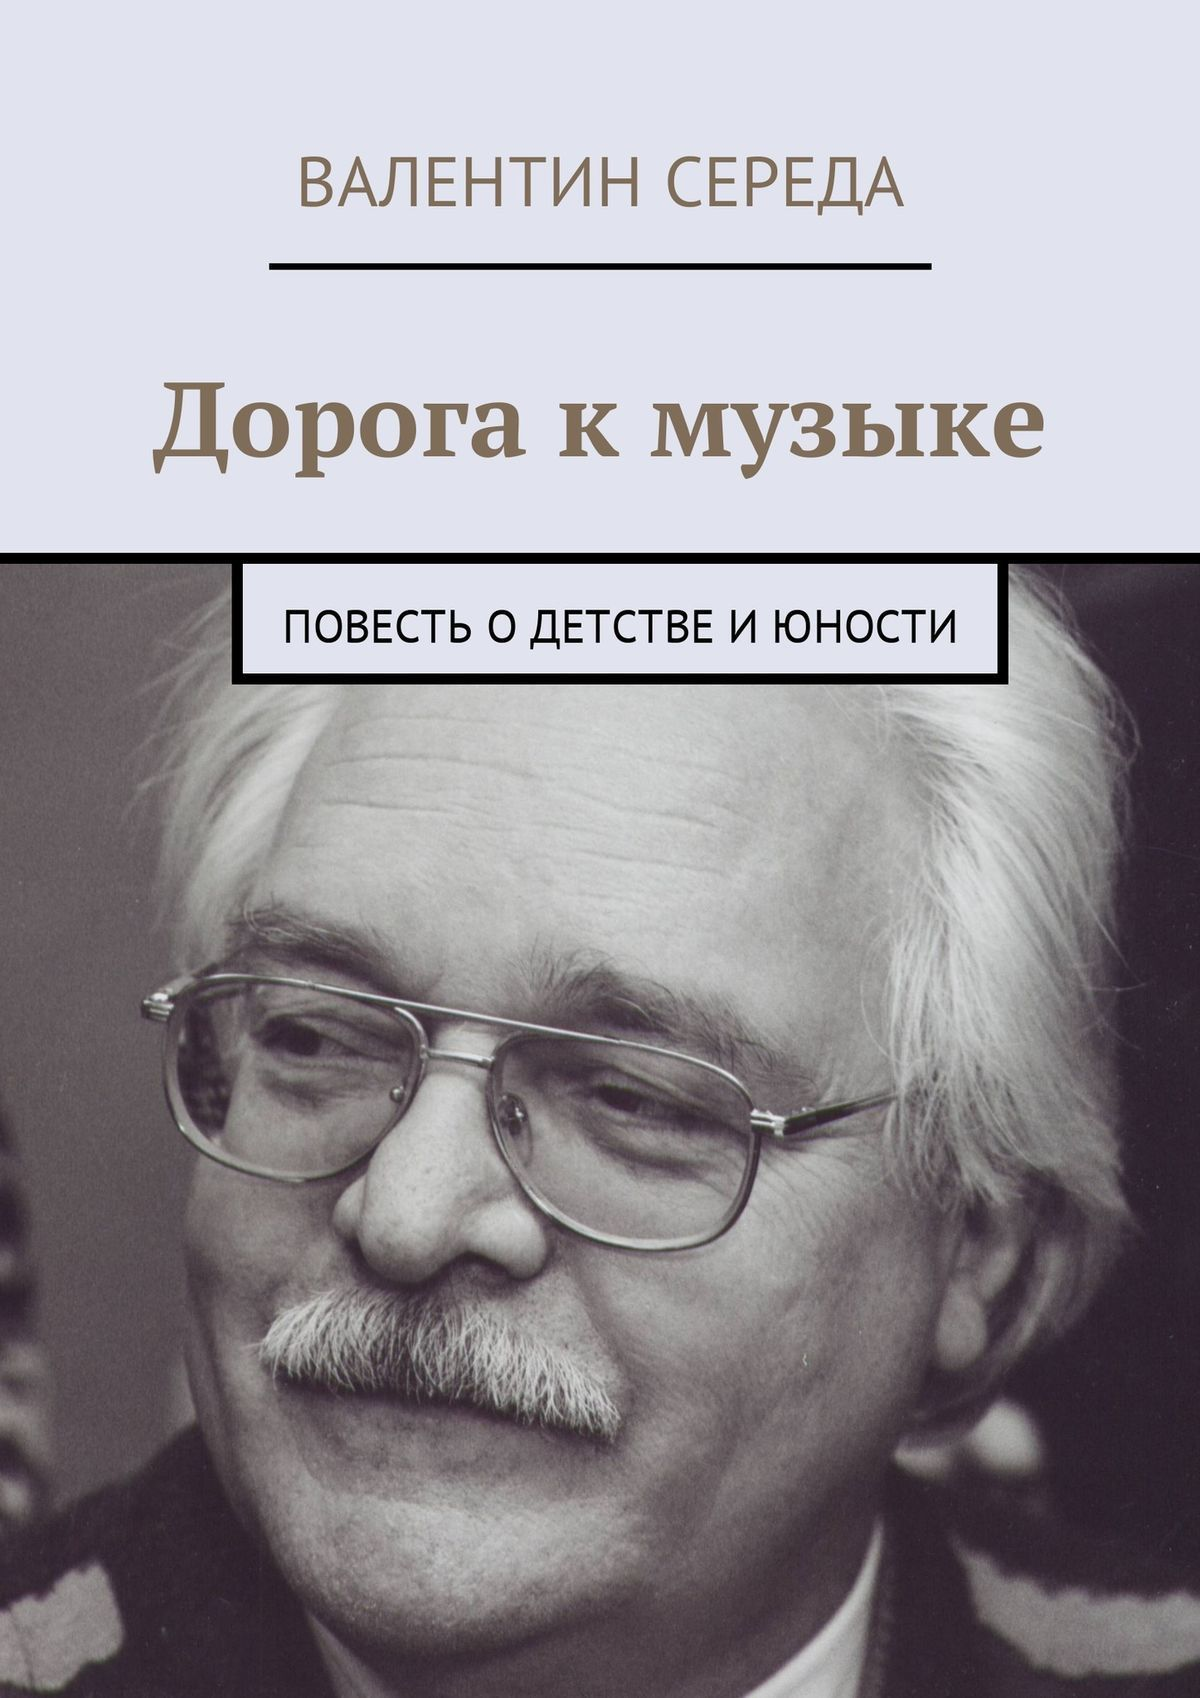 Валентин Середа бесплатно